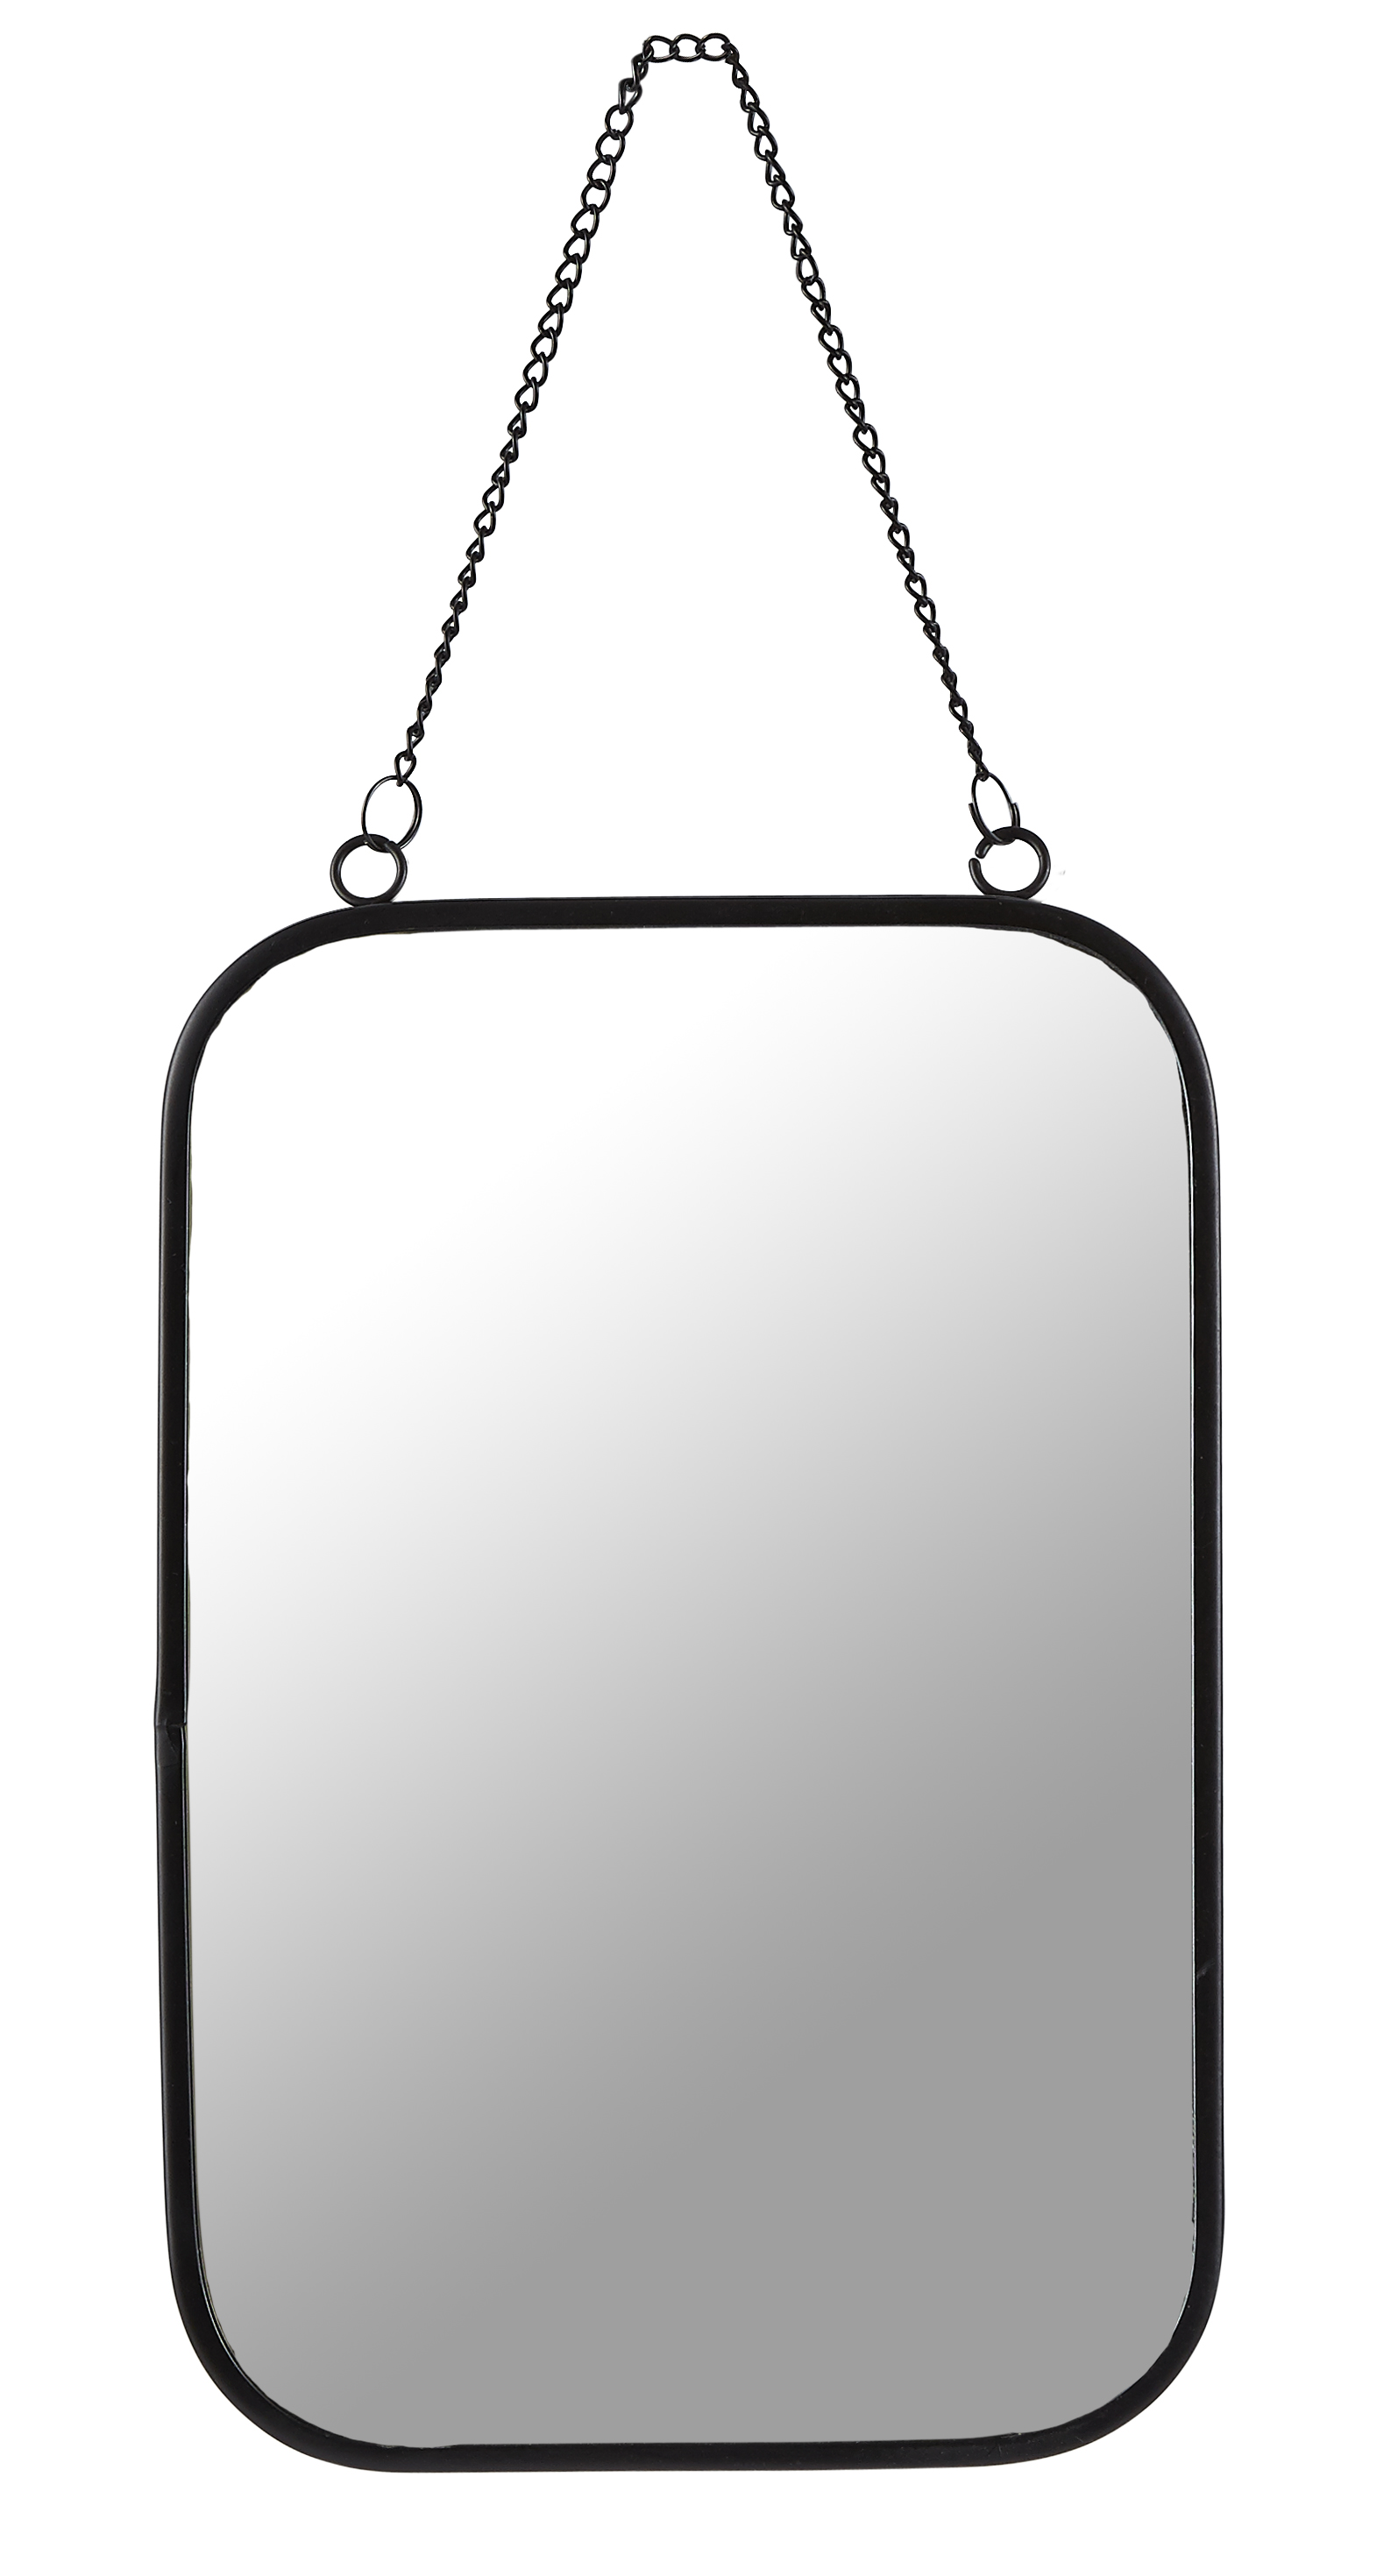 Spegel Metall Svart 30x20 cm